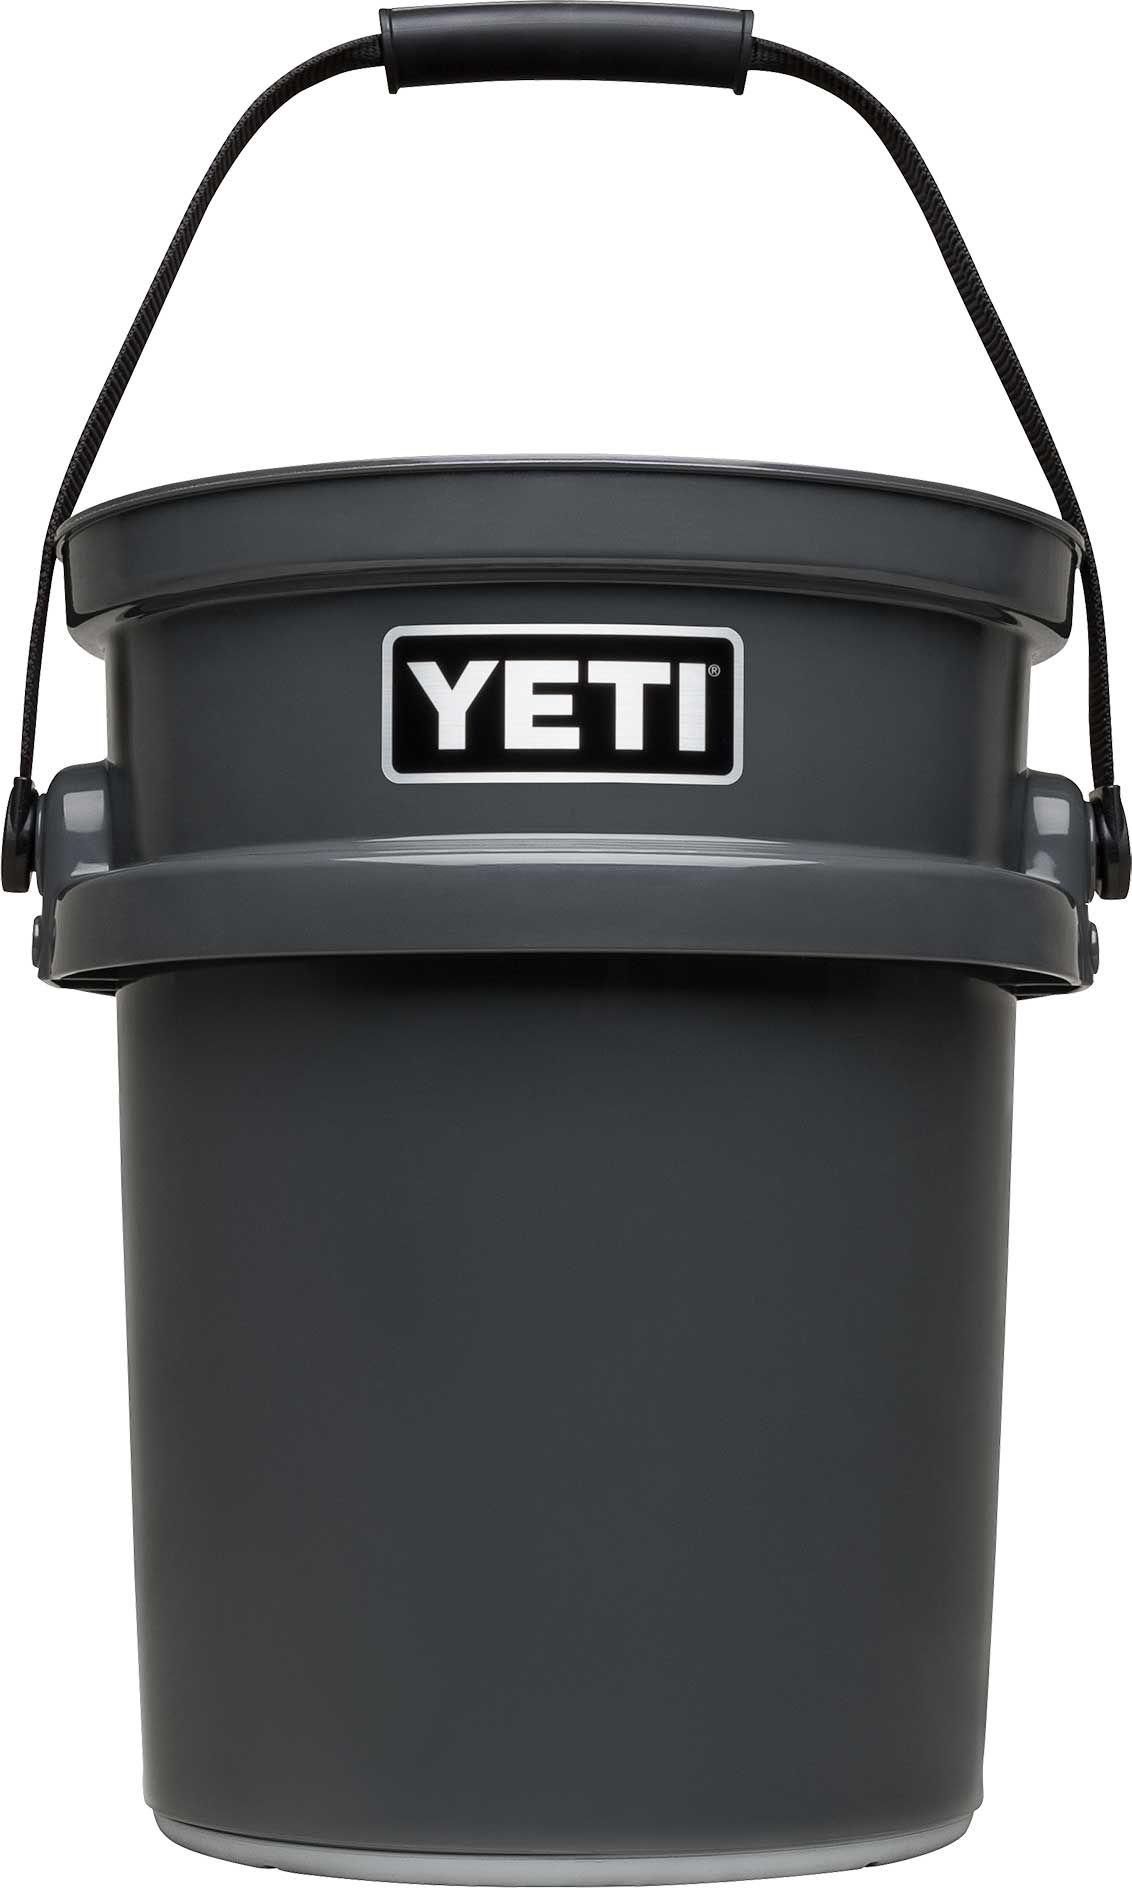 yeti loadout bucket